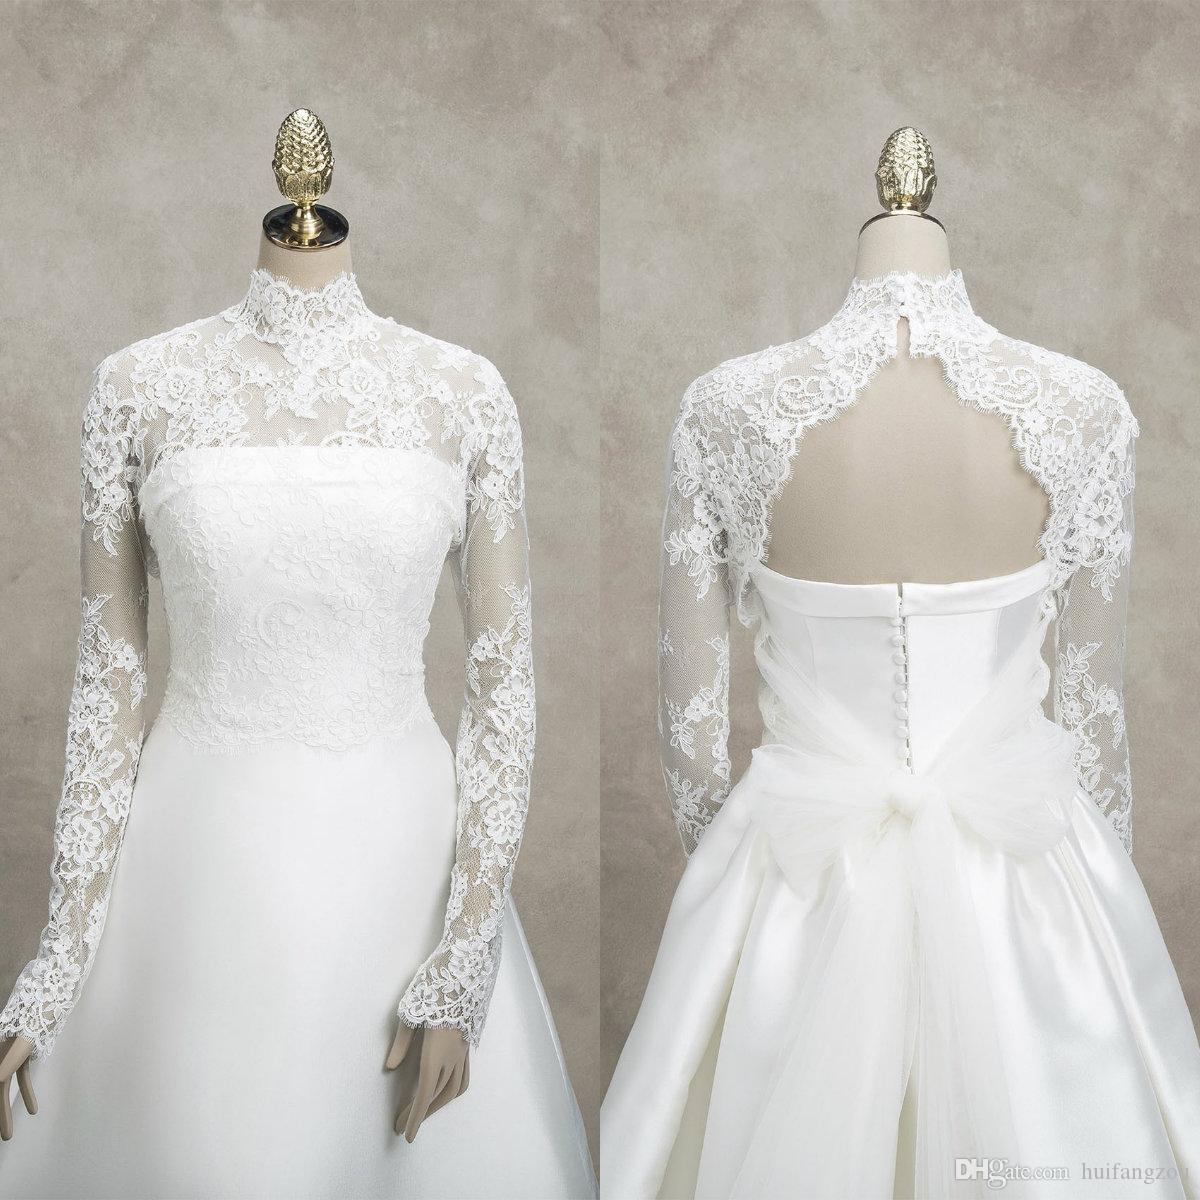 Bridal Lace Jacket High Collar Long Sleeves Appliques Wrap Sheath Bridal Bolero For Wedding Dresses Custom Made High Quality Jacket